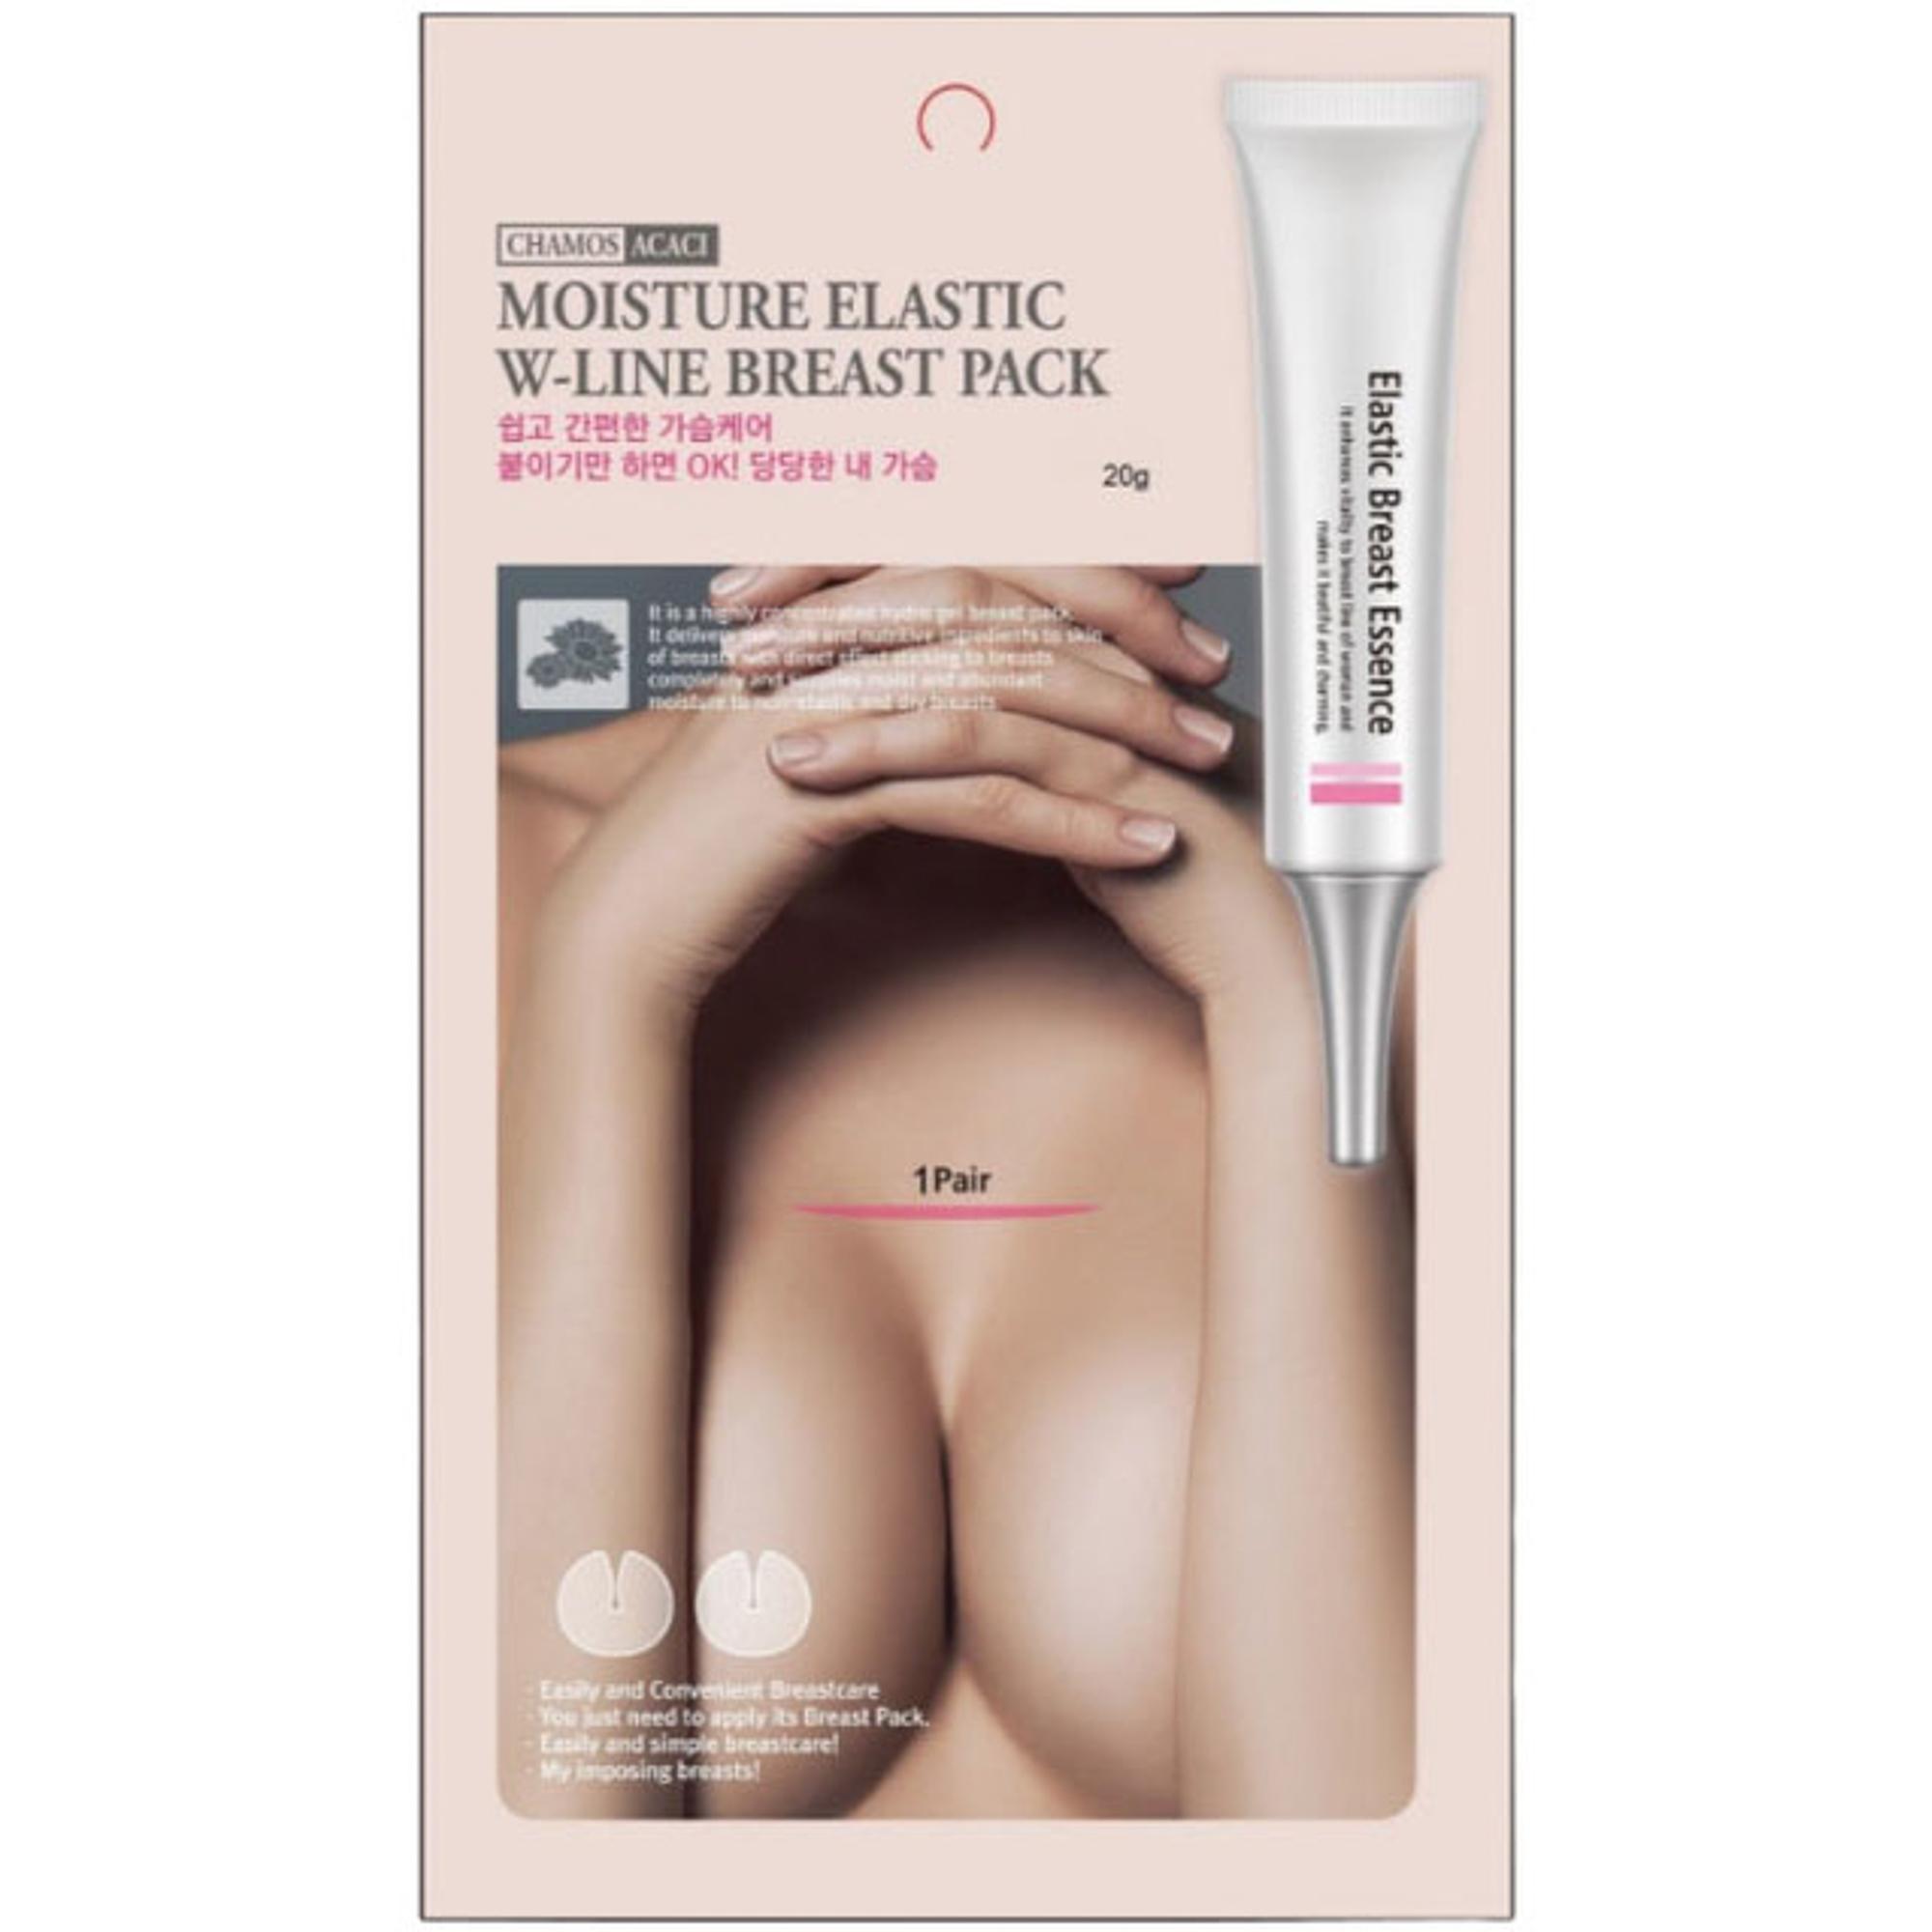 Патчи для бюста Chamos Acaci Moisture Elastic W-Line Breast Pack 20 г